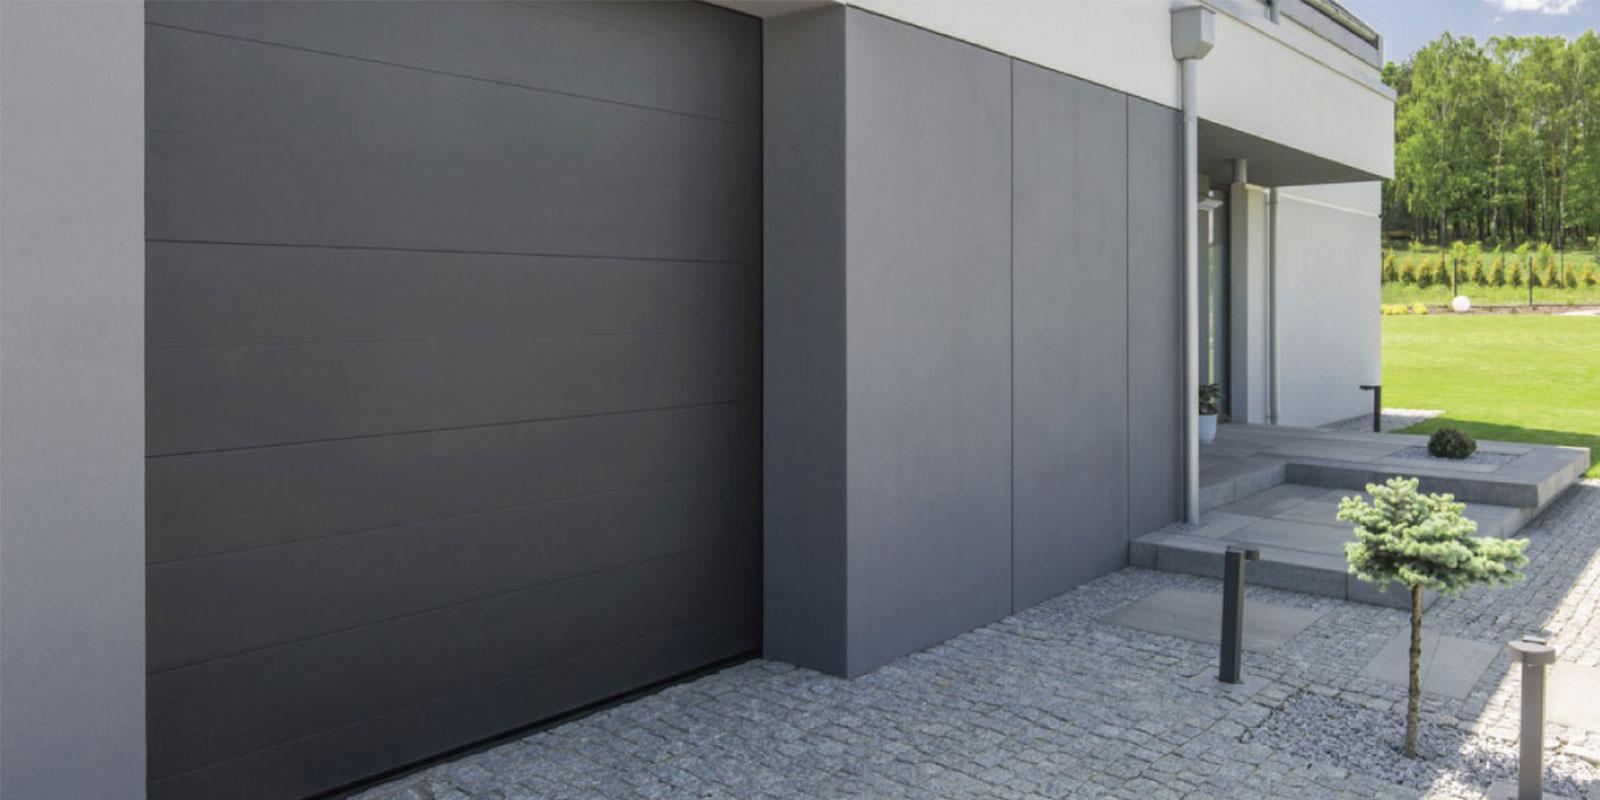 Pose de volets roulants pose de portes de garage for Garage avenir marcq en baroeul